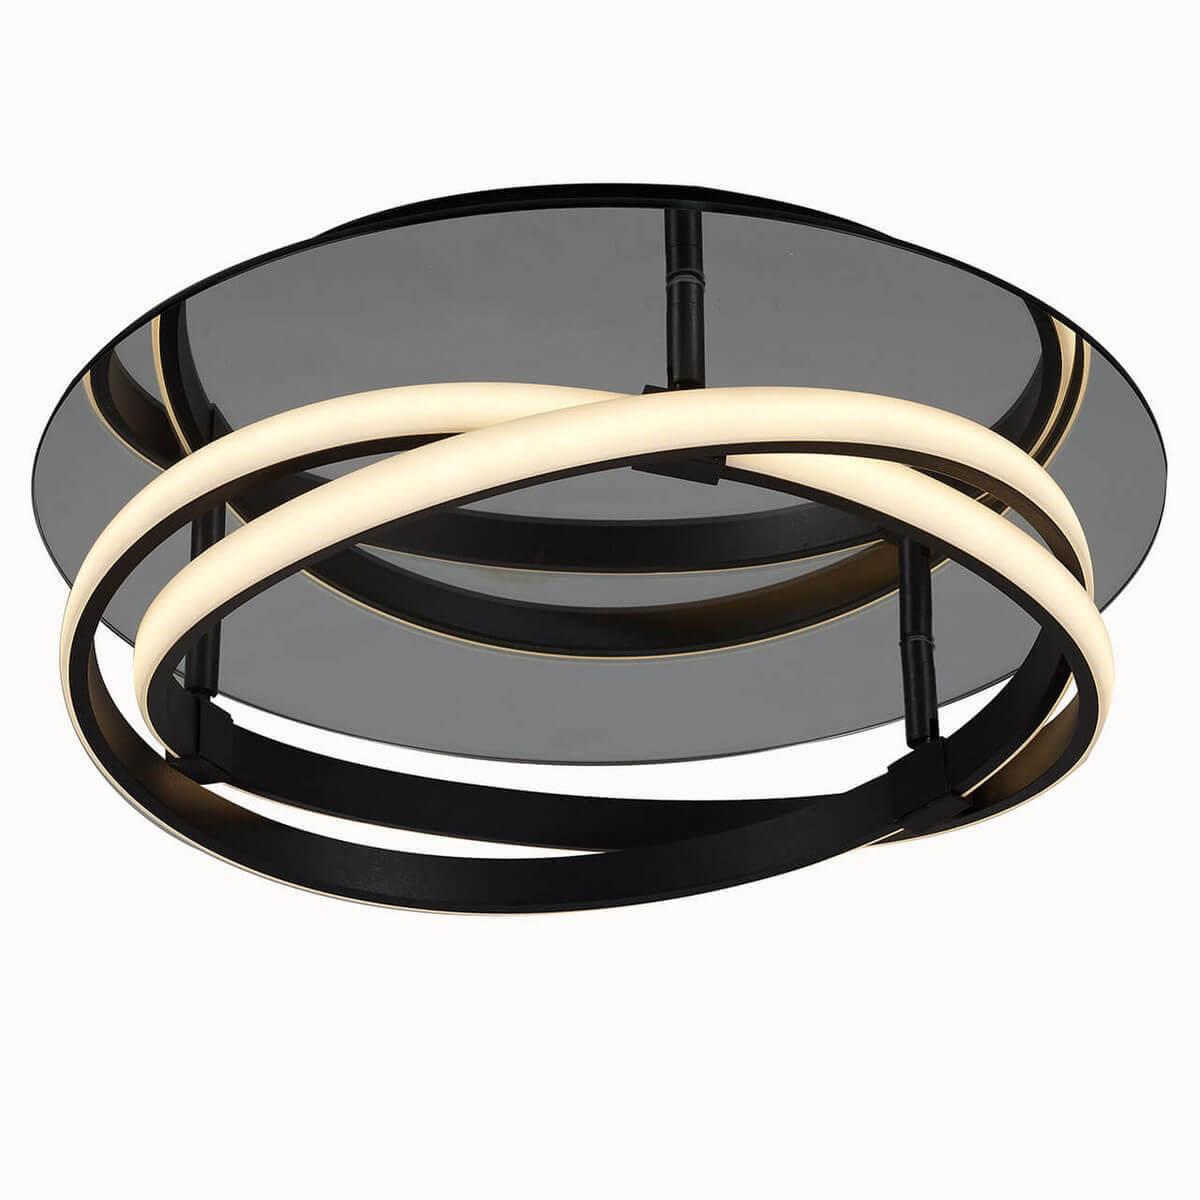 цена на Светильник Mantra 5392 Infinity